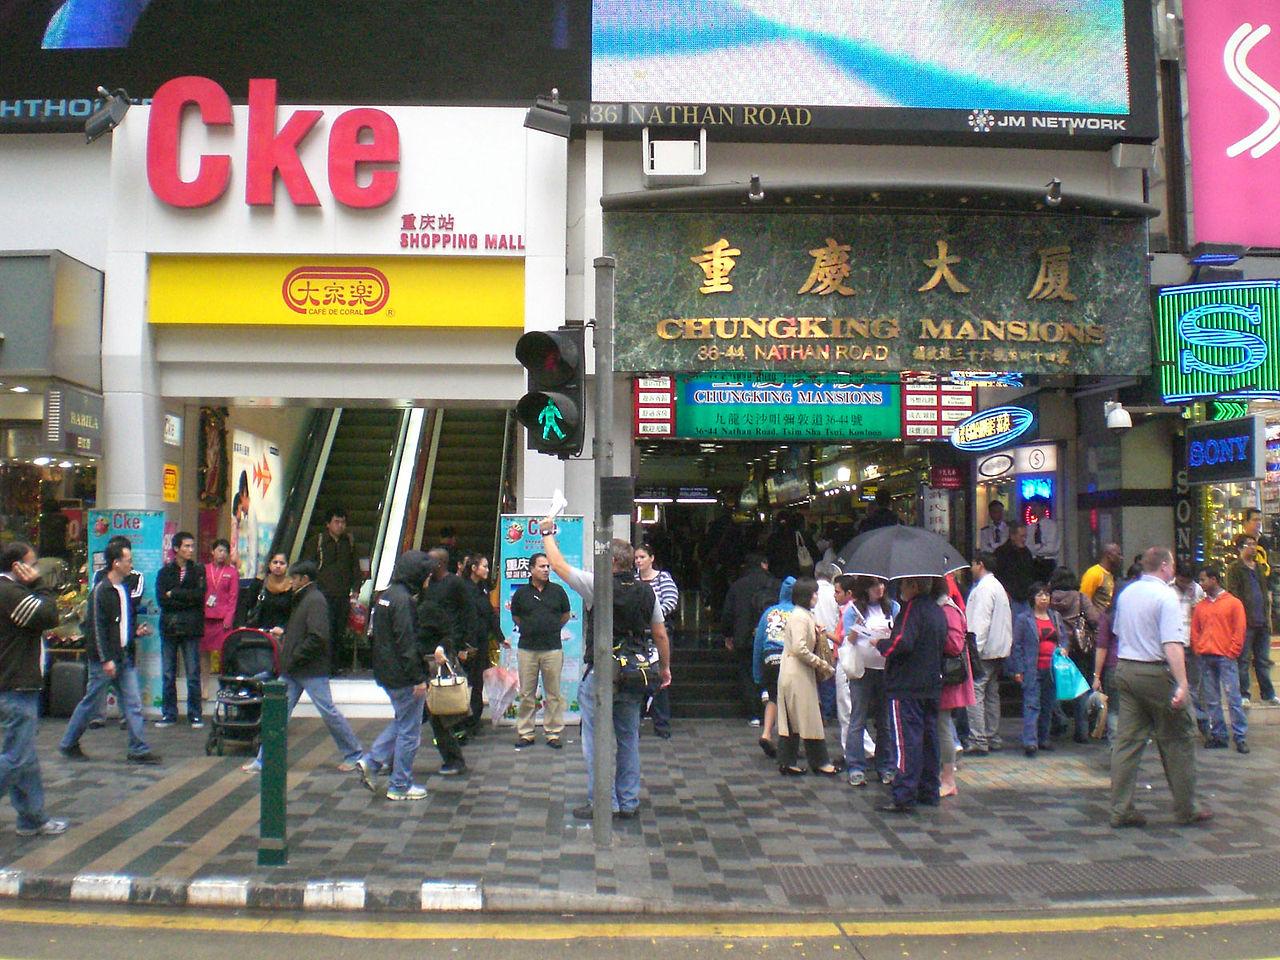 file hk tst nathan road chungking mansion cke cafe de carol restaurant wikimedia commons. Black Bedroom Furniture Sets. Home Design Ideas